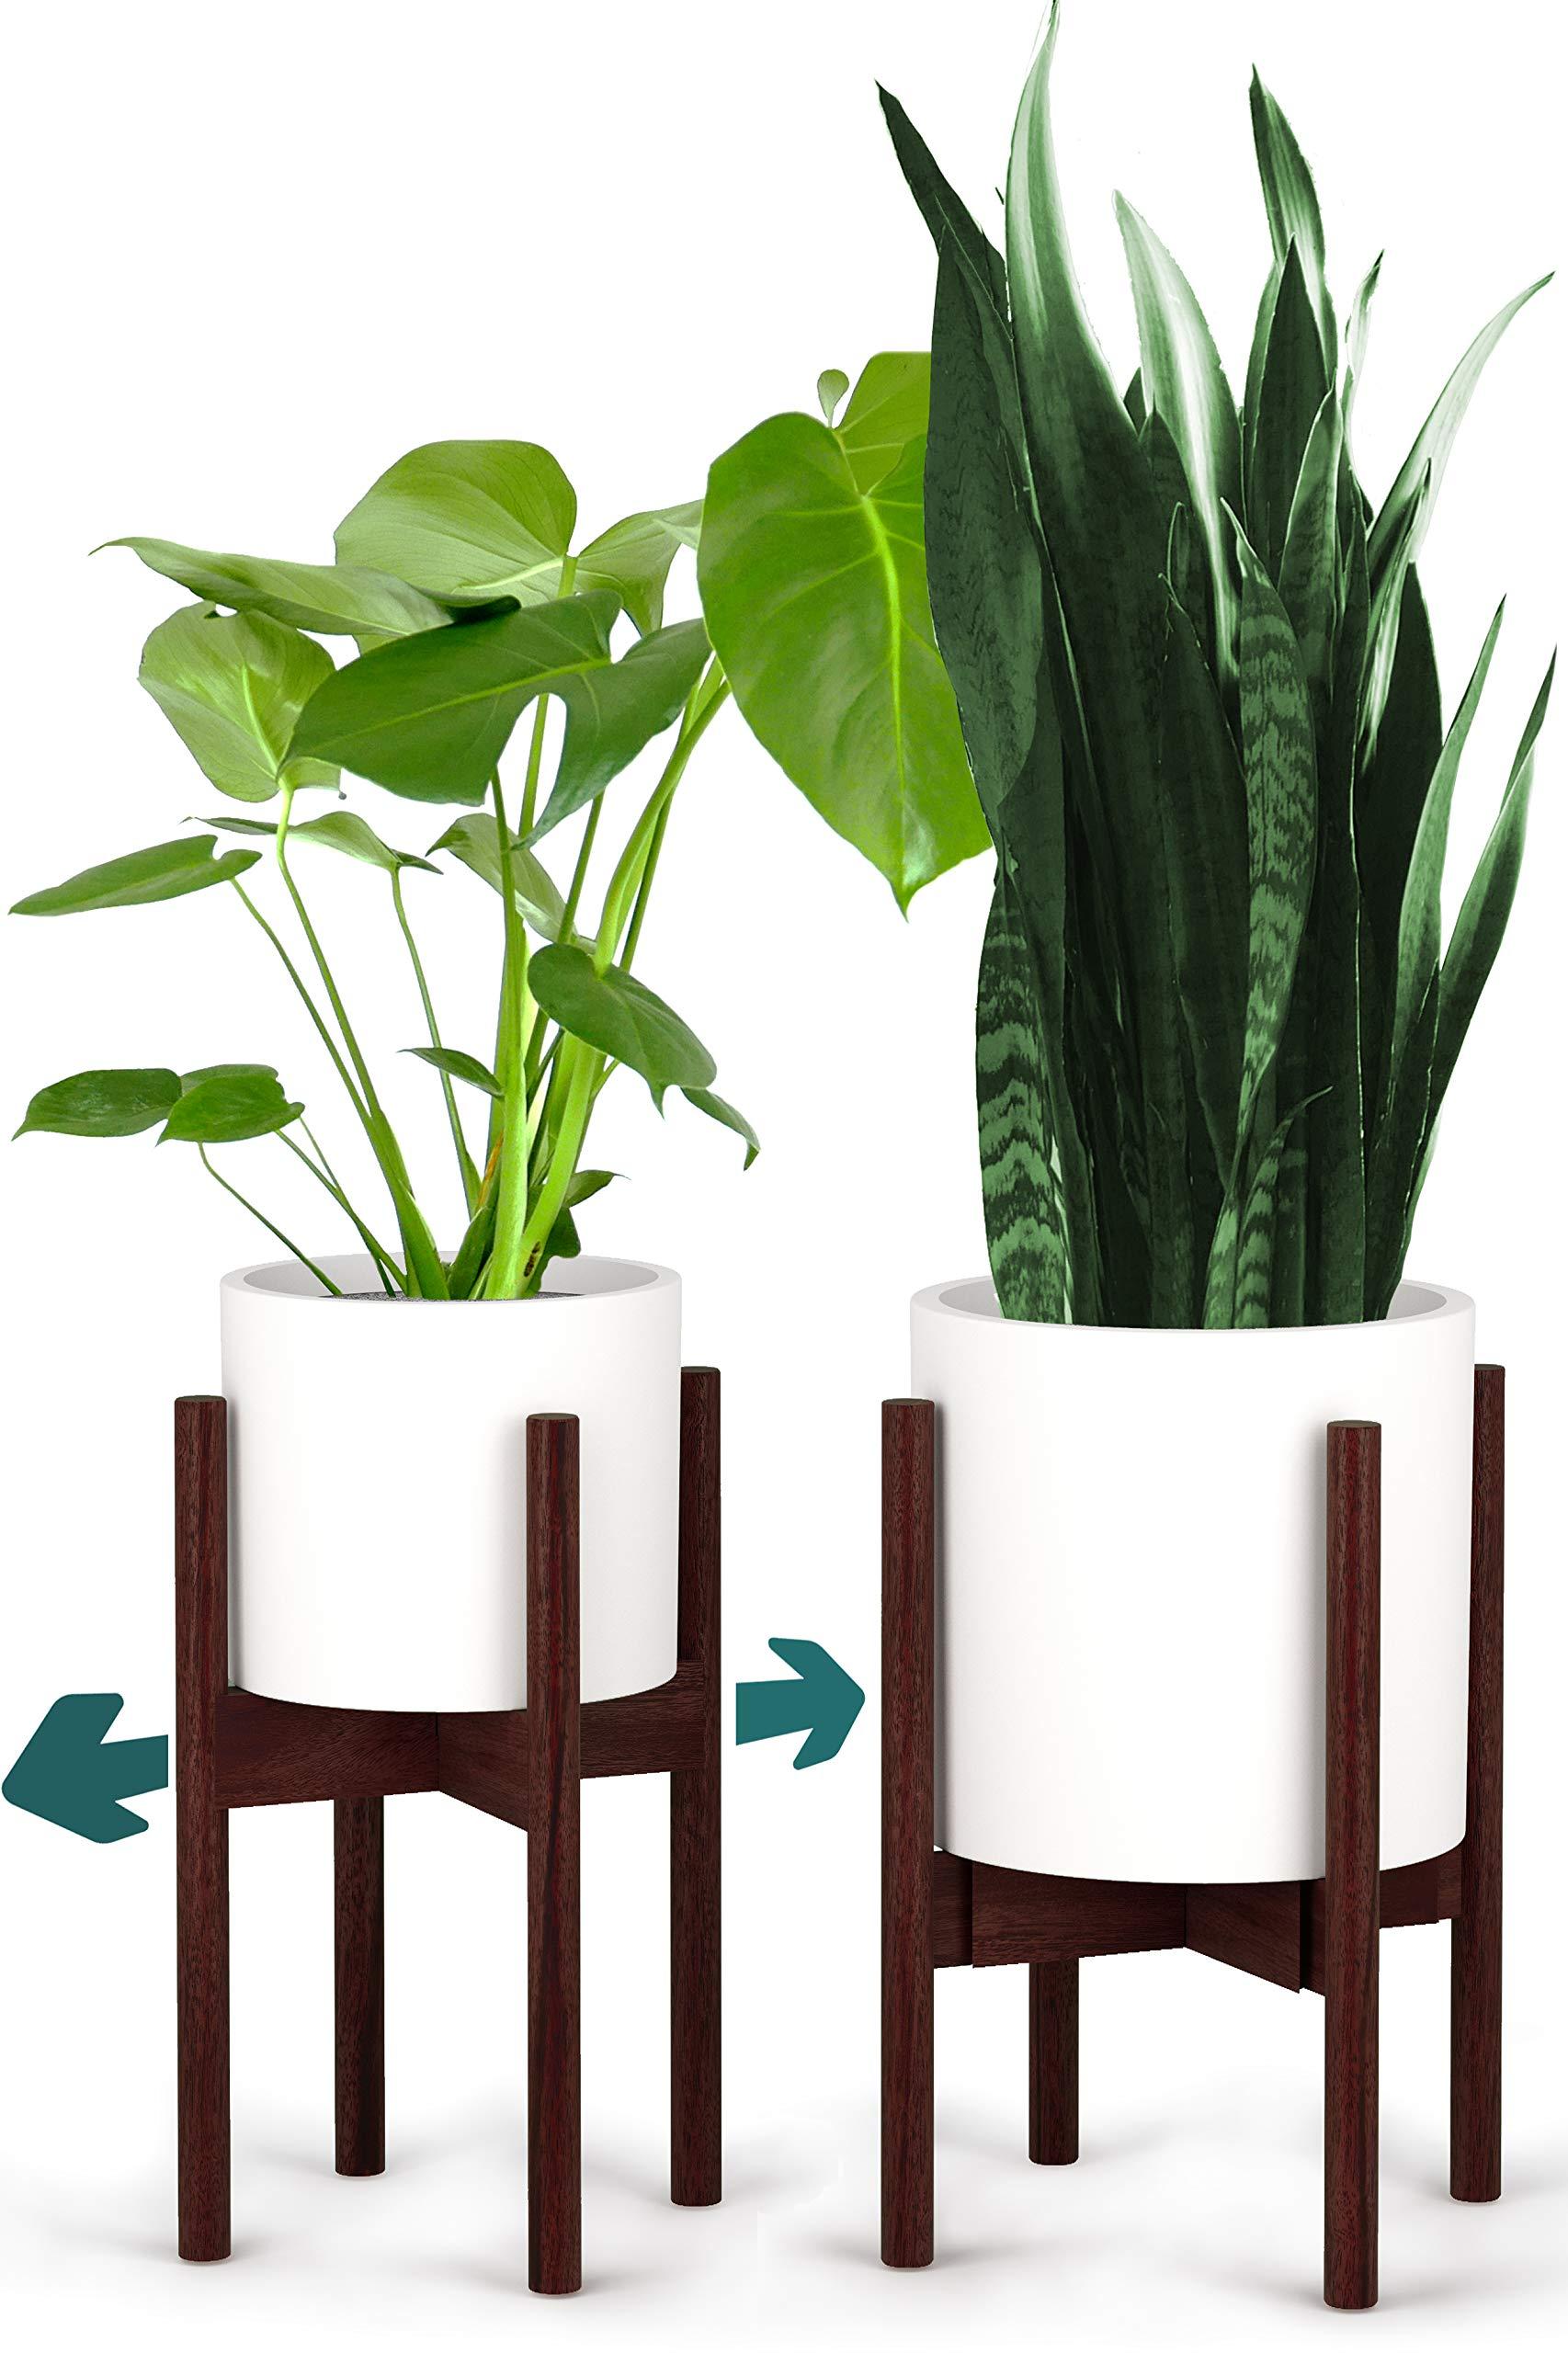 Fox & Fern Indoor Plant Stand - Adjustable Width 8'' up to 12'' - Dark Walnut - EXCLUDING Plant Pot